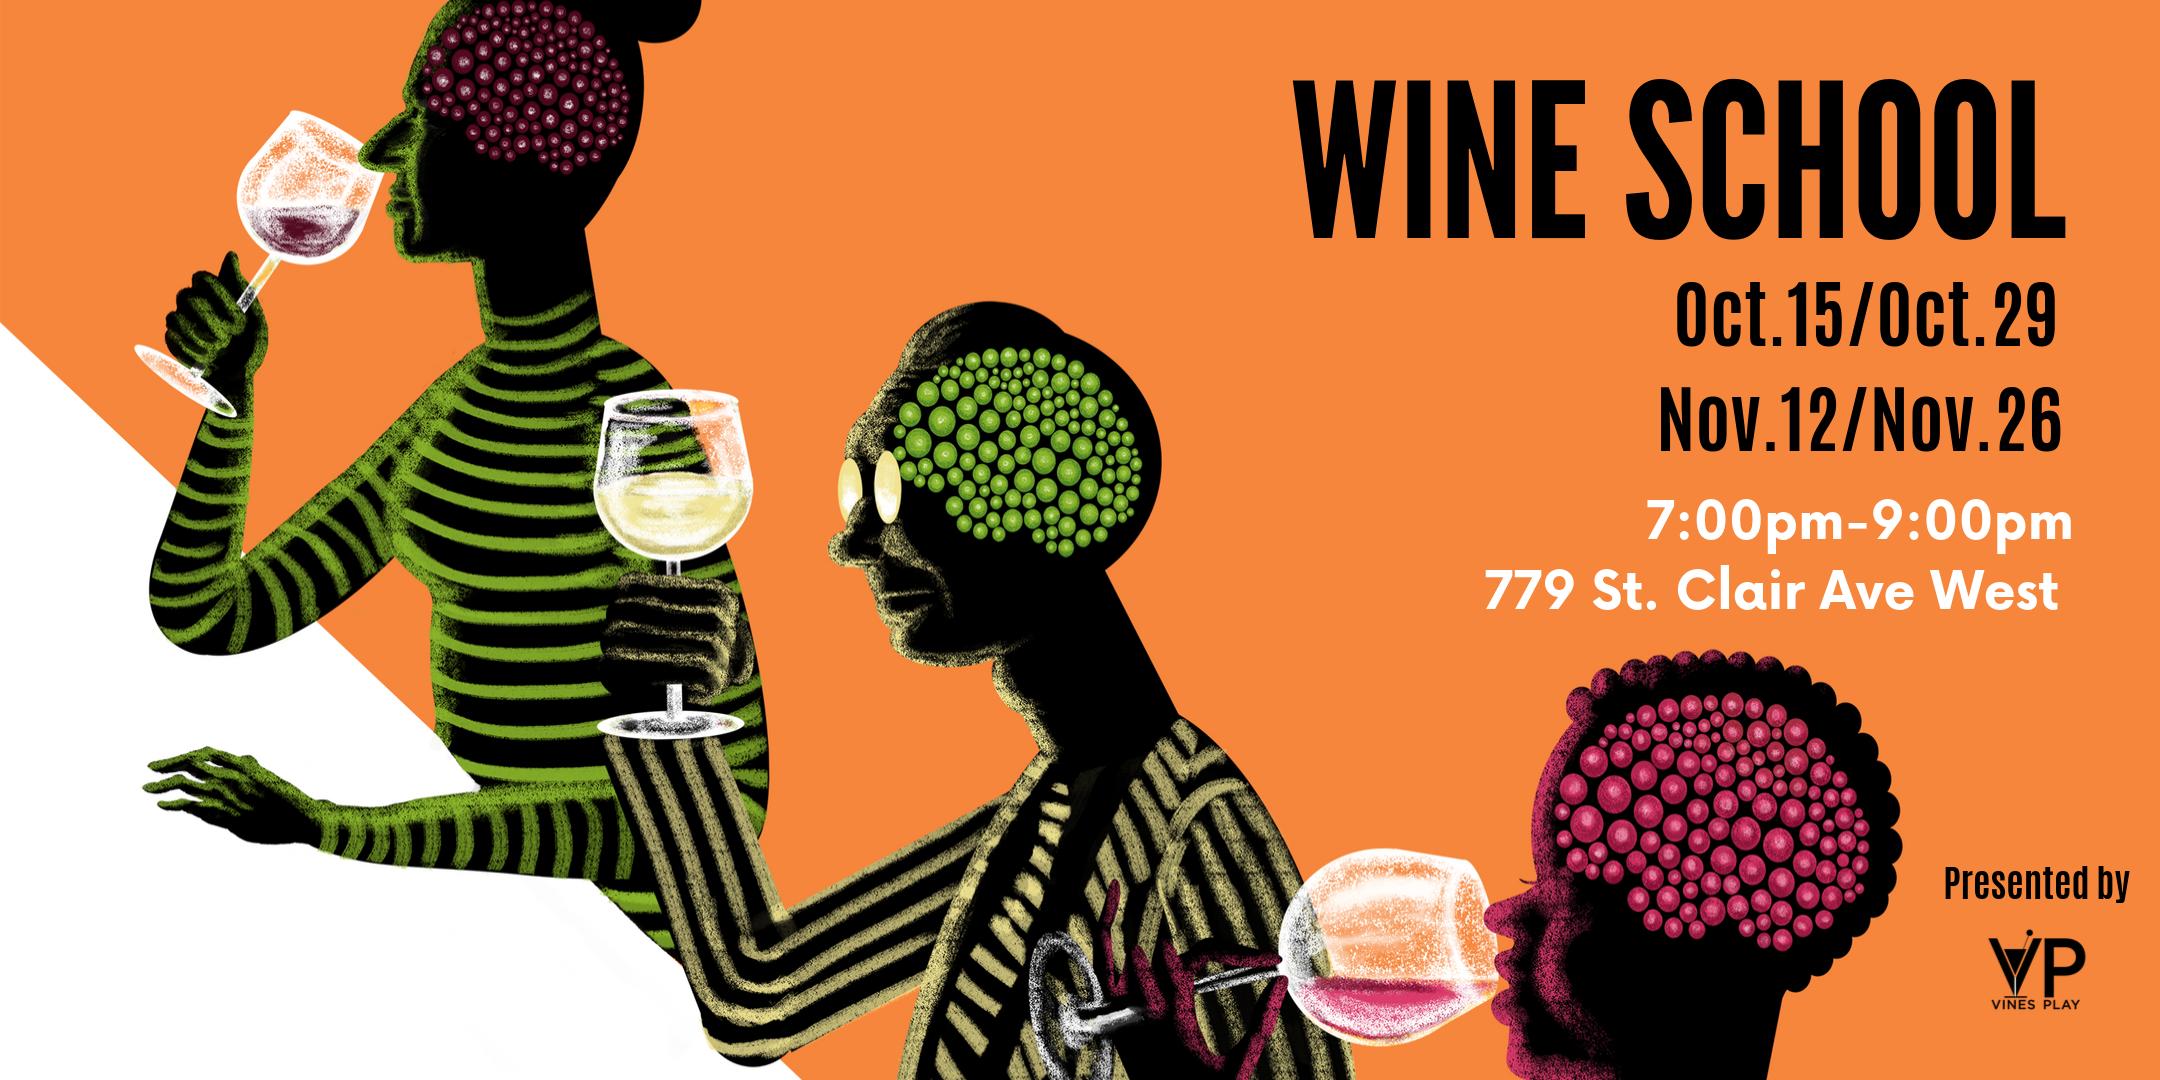 eventbrite image wine school.png